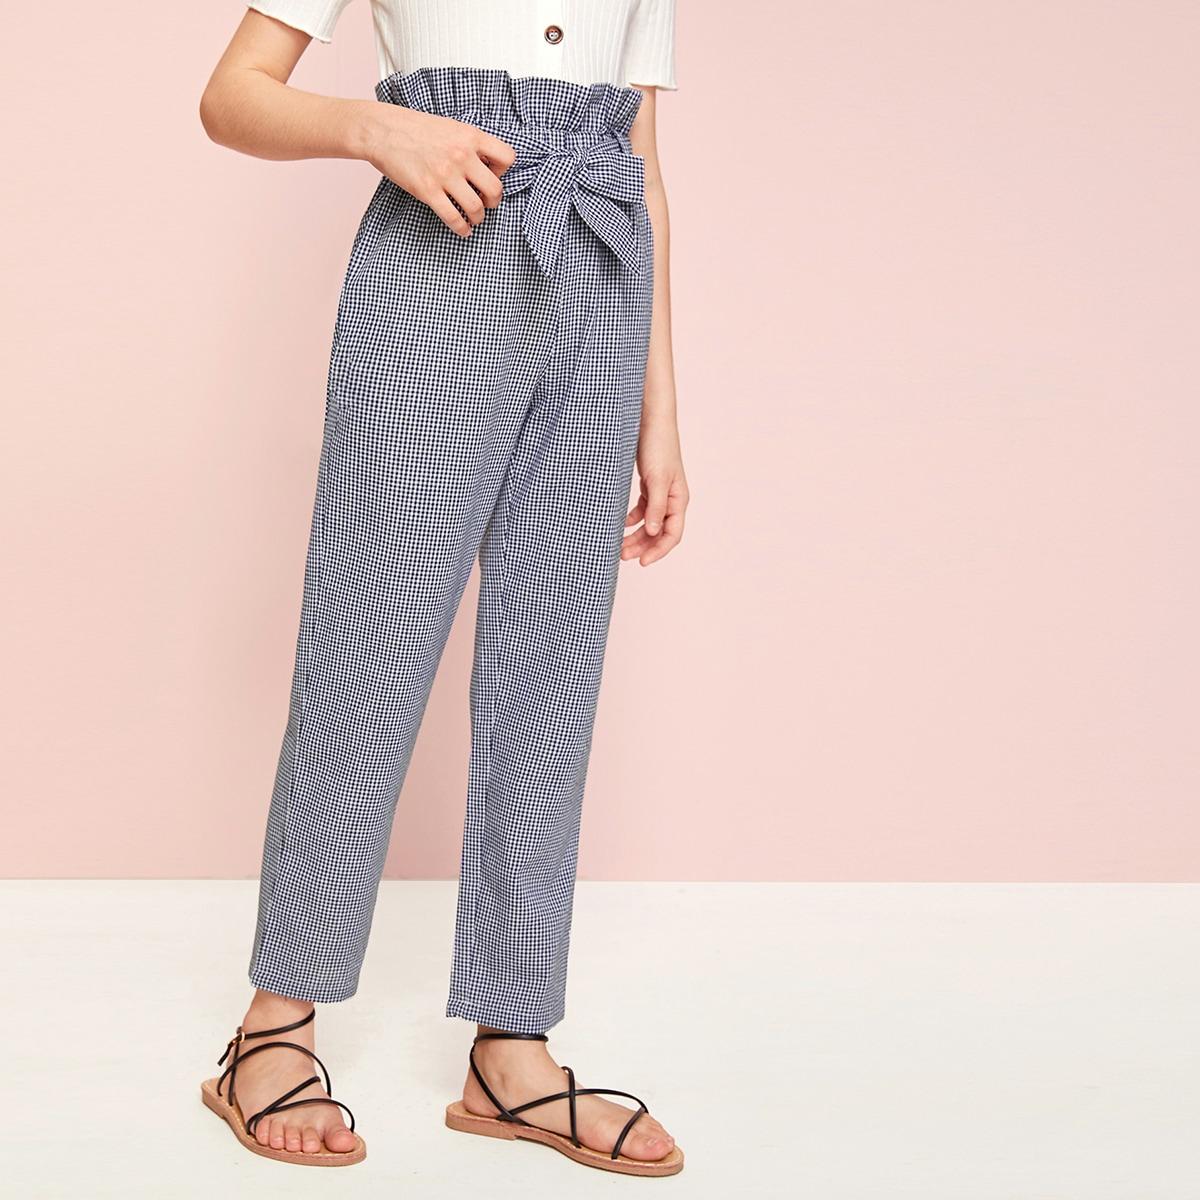 SHEIN / Pantalones de niñas de cuadros con cinturón de cintura con volante